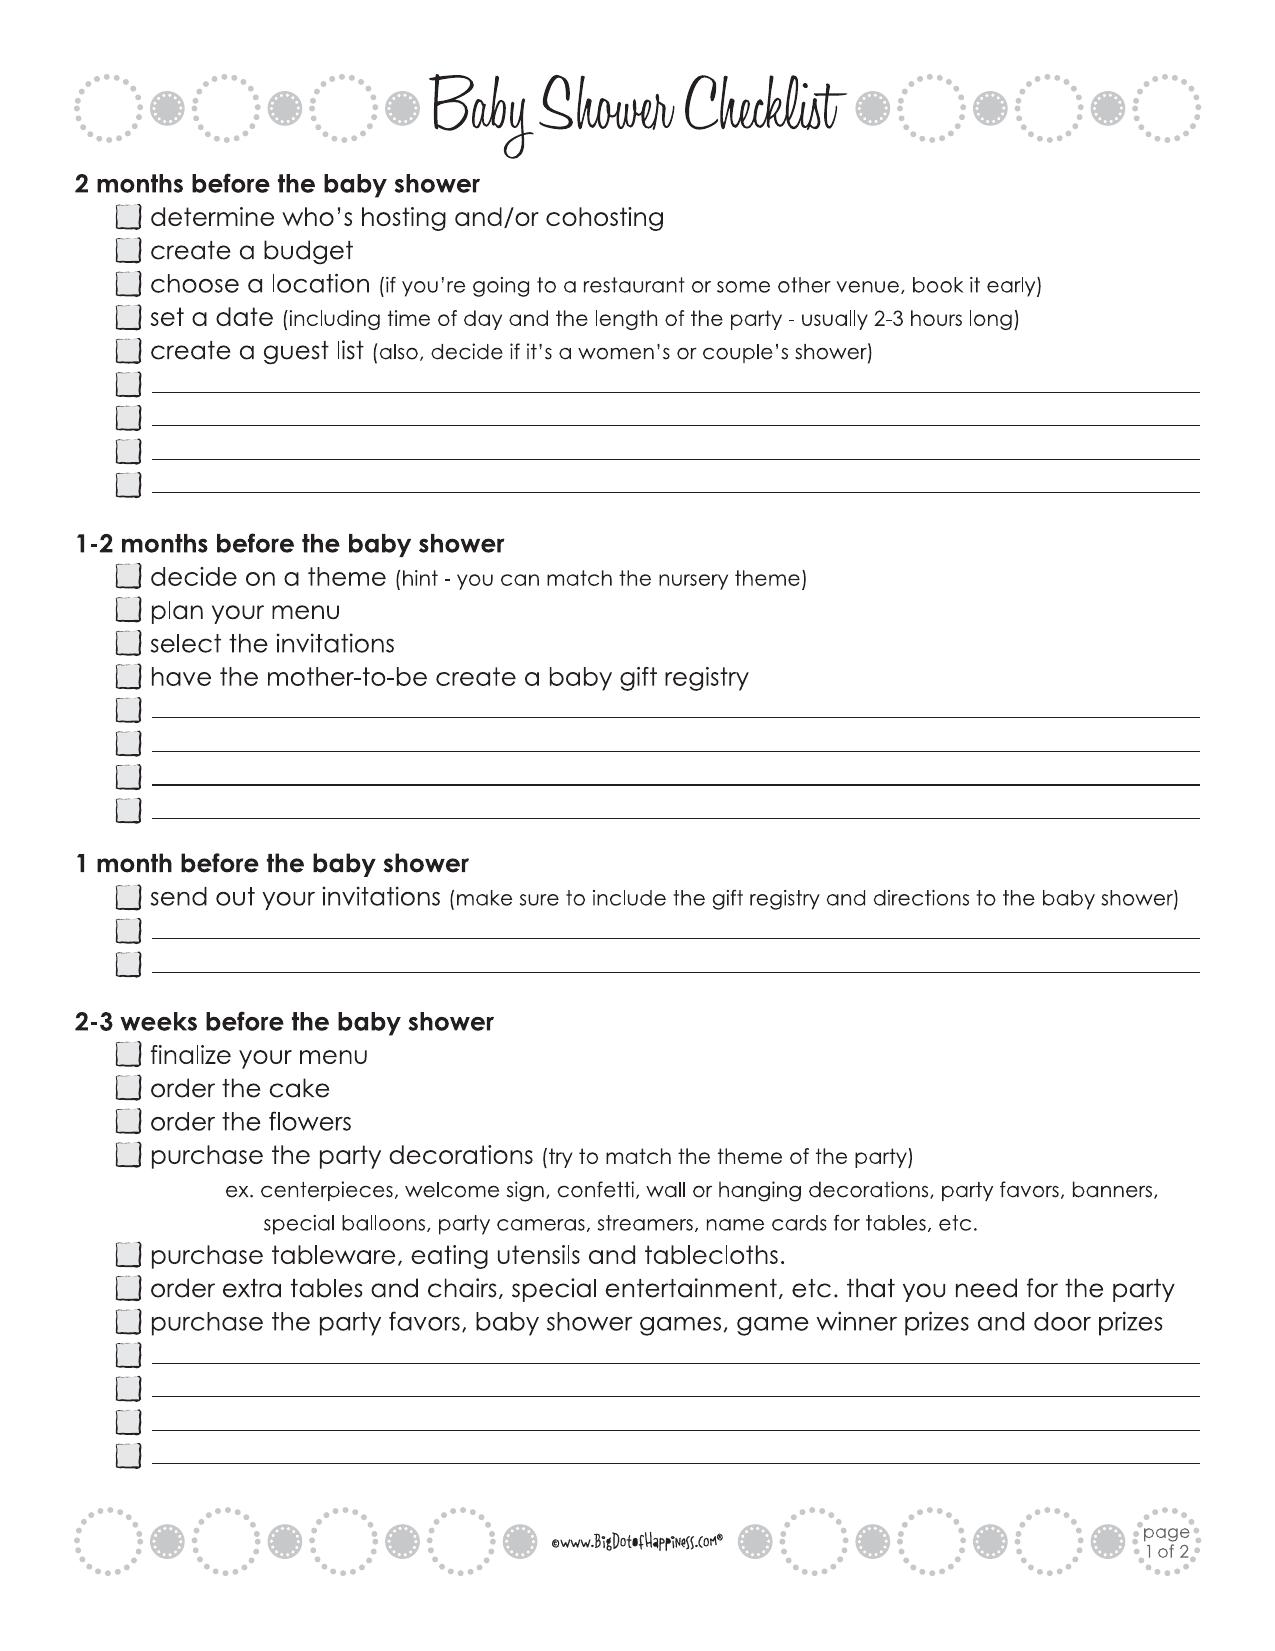 Download Baby Shower Checklist Template